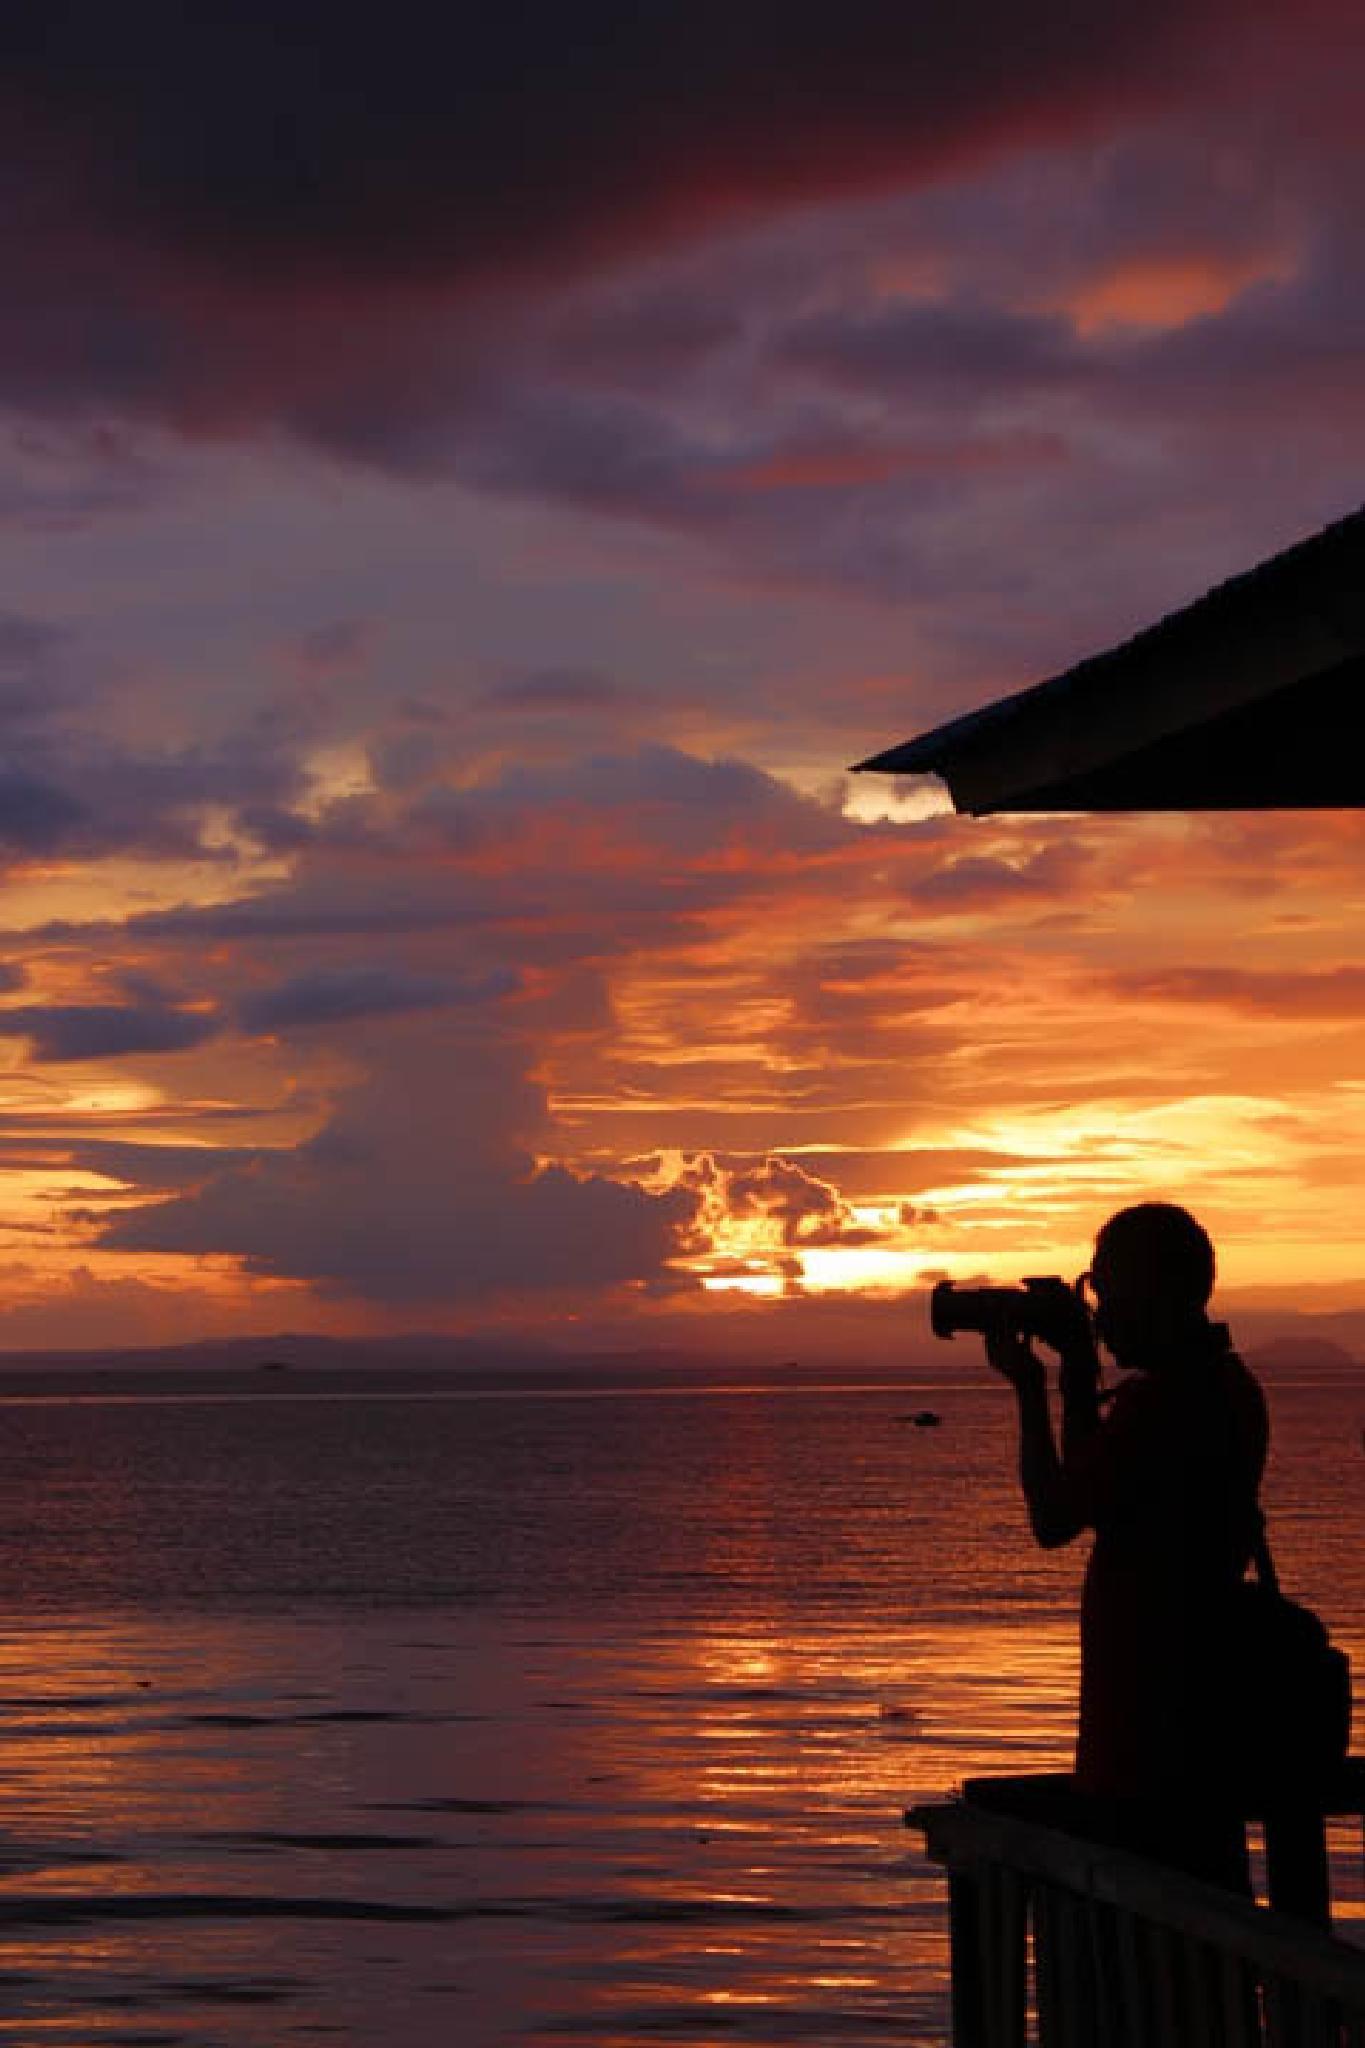 #Silhuette#Photographer#Sunset by Hamzah Zain